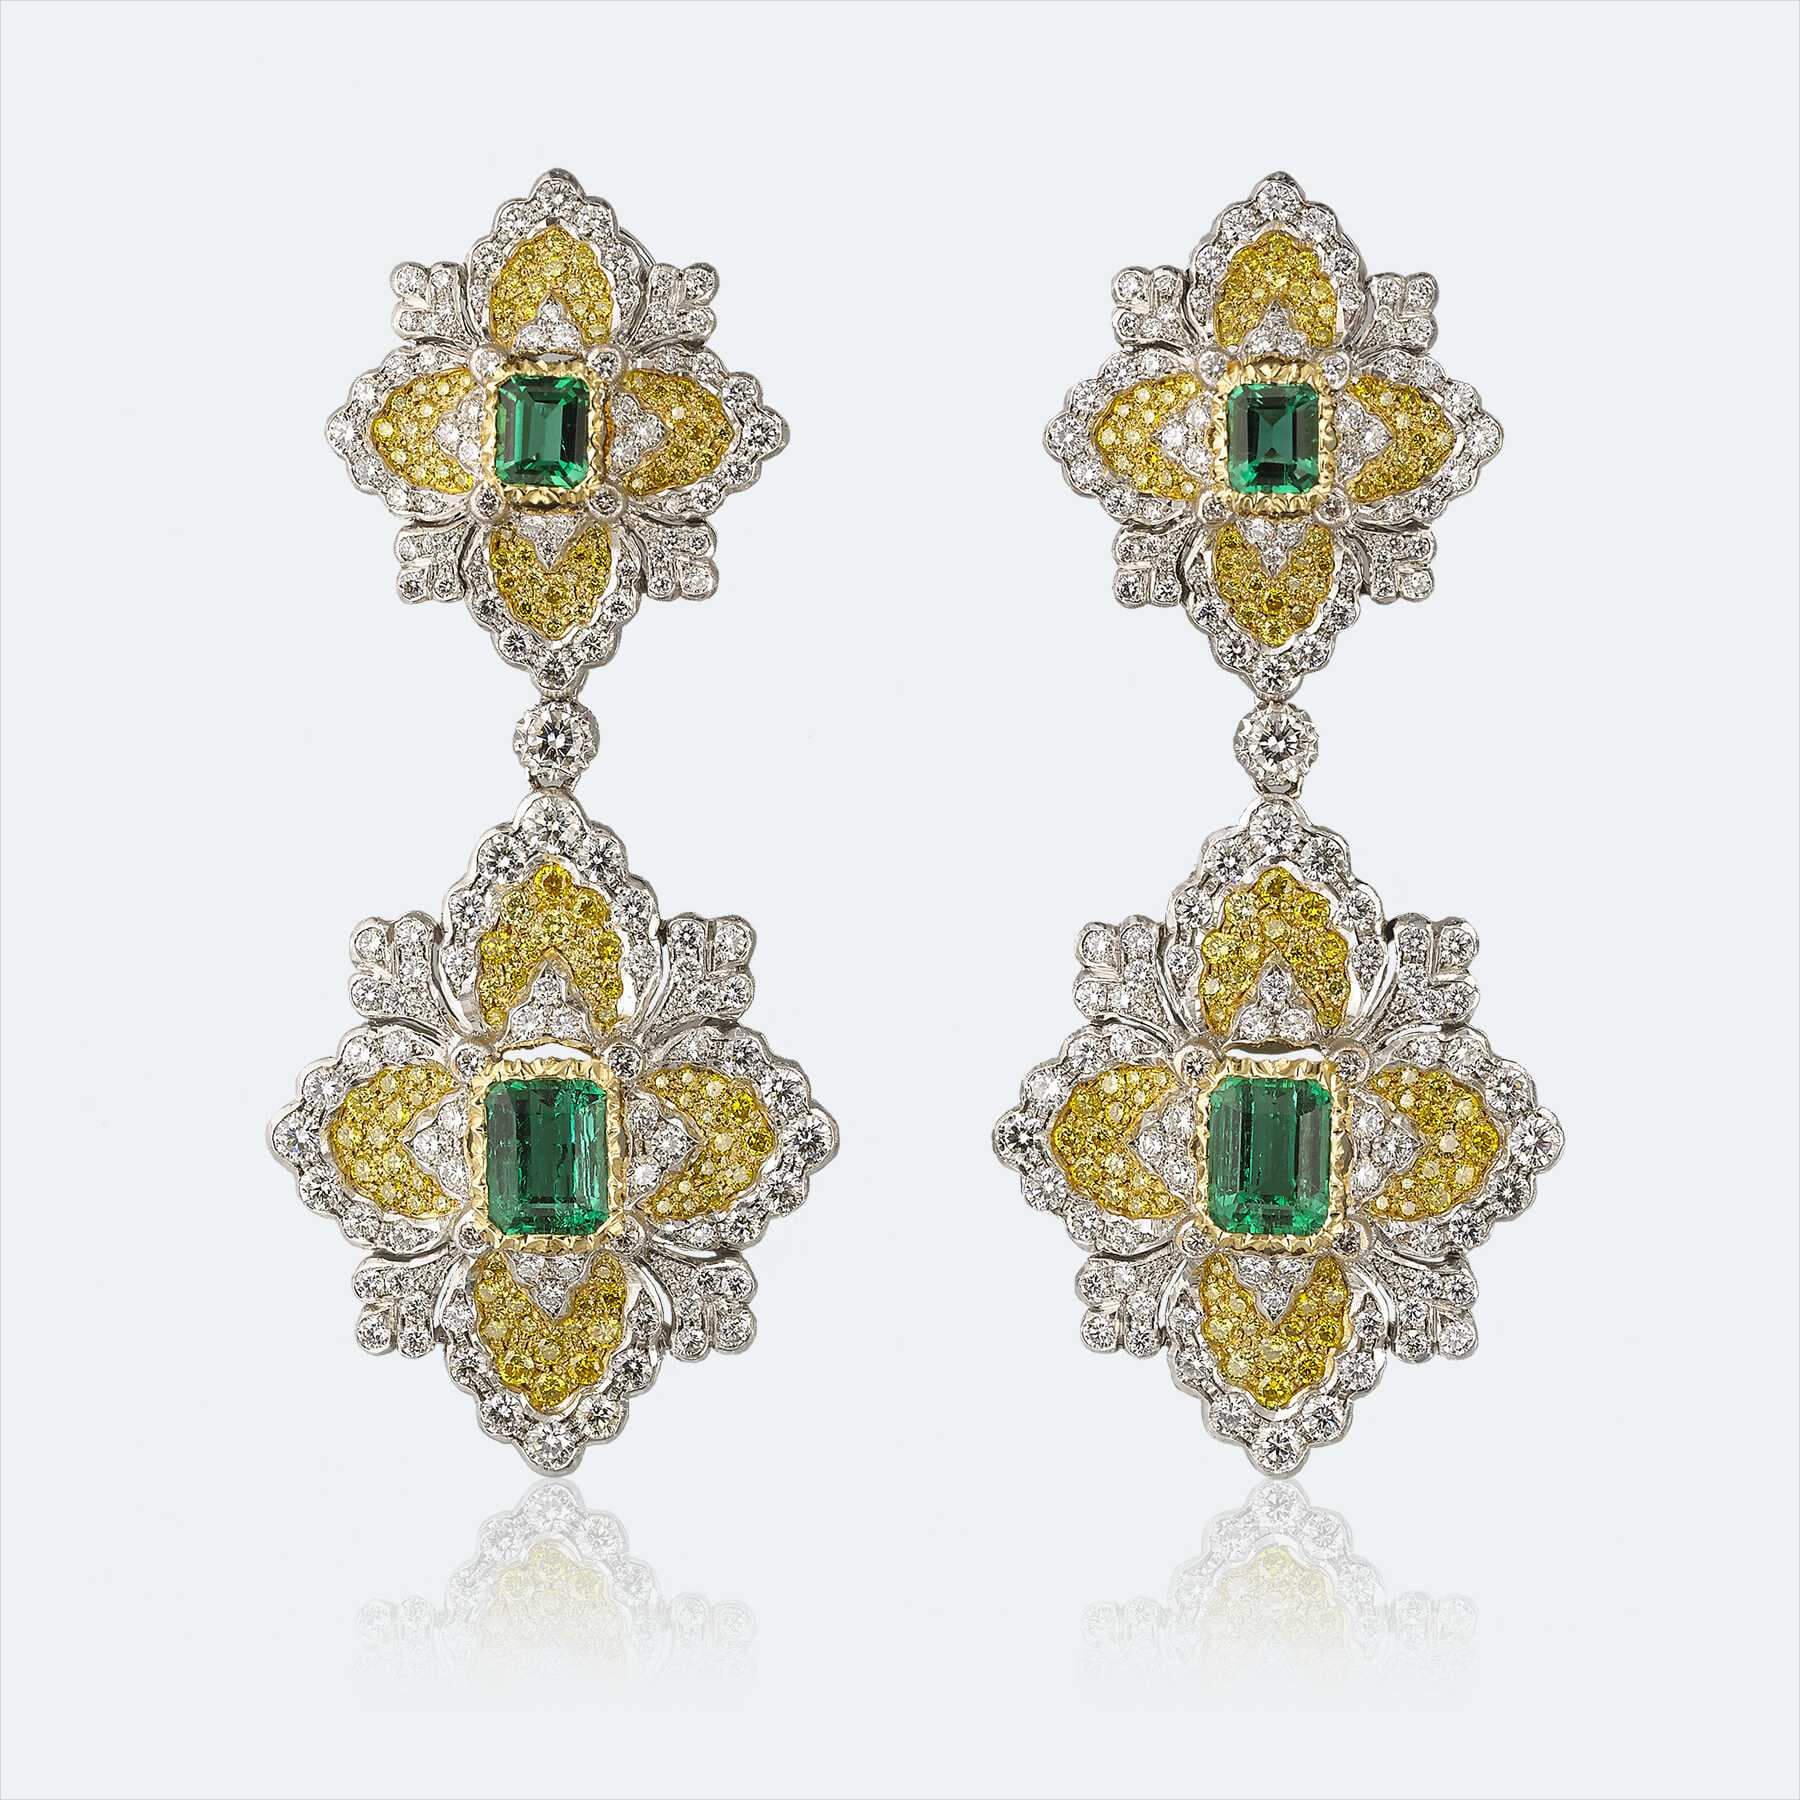 buccellati pendant earrings in white gold set with diamonds 1